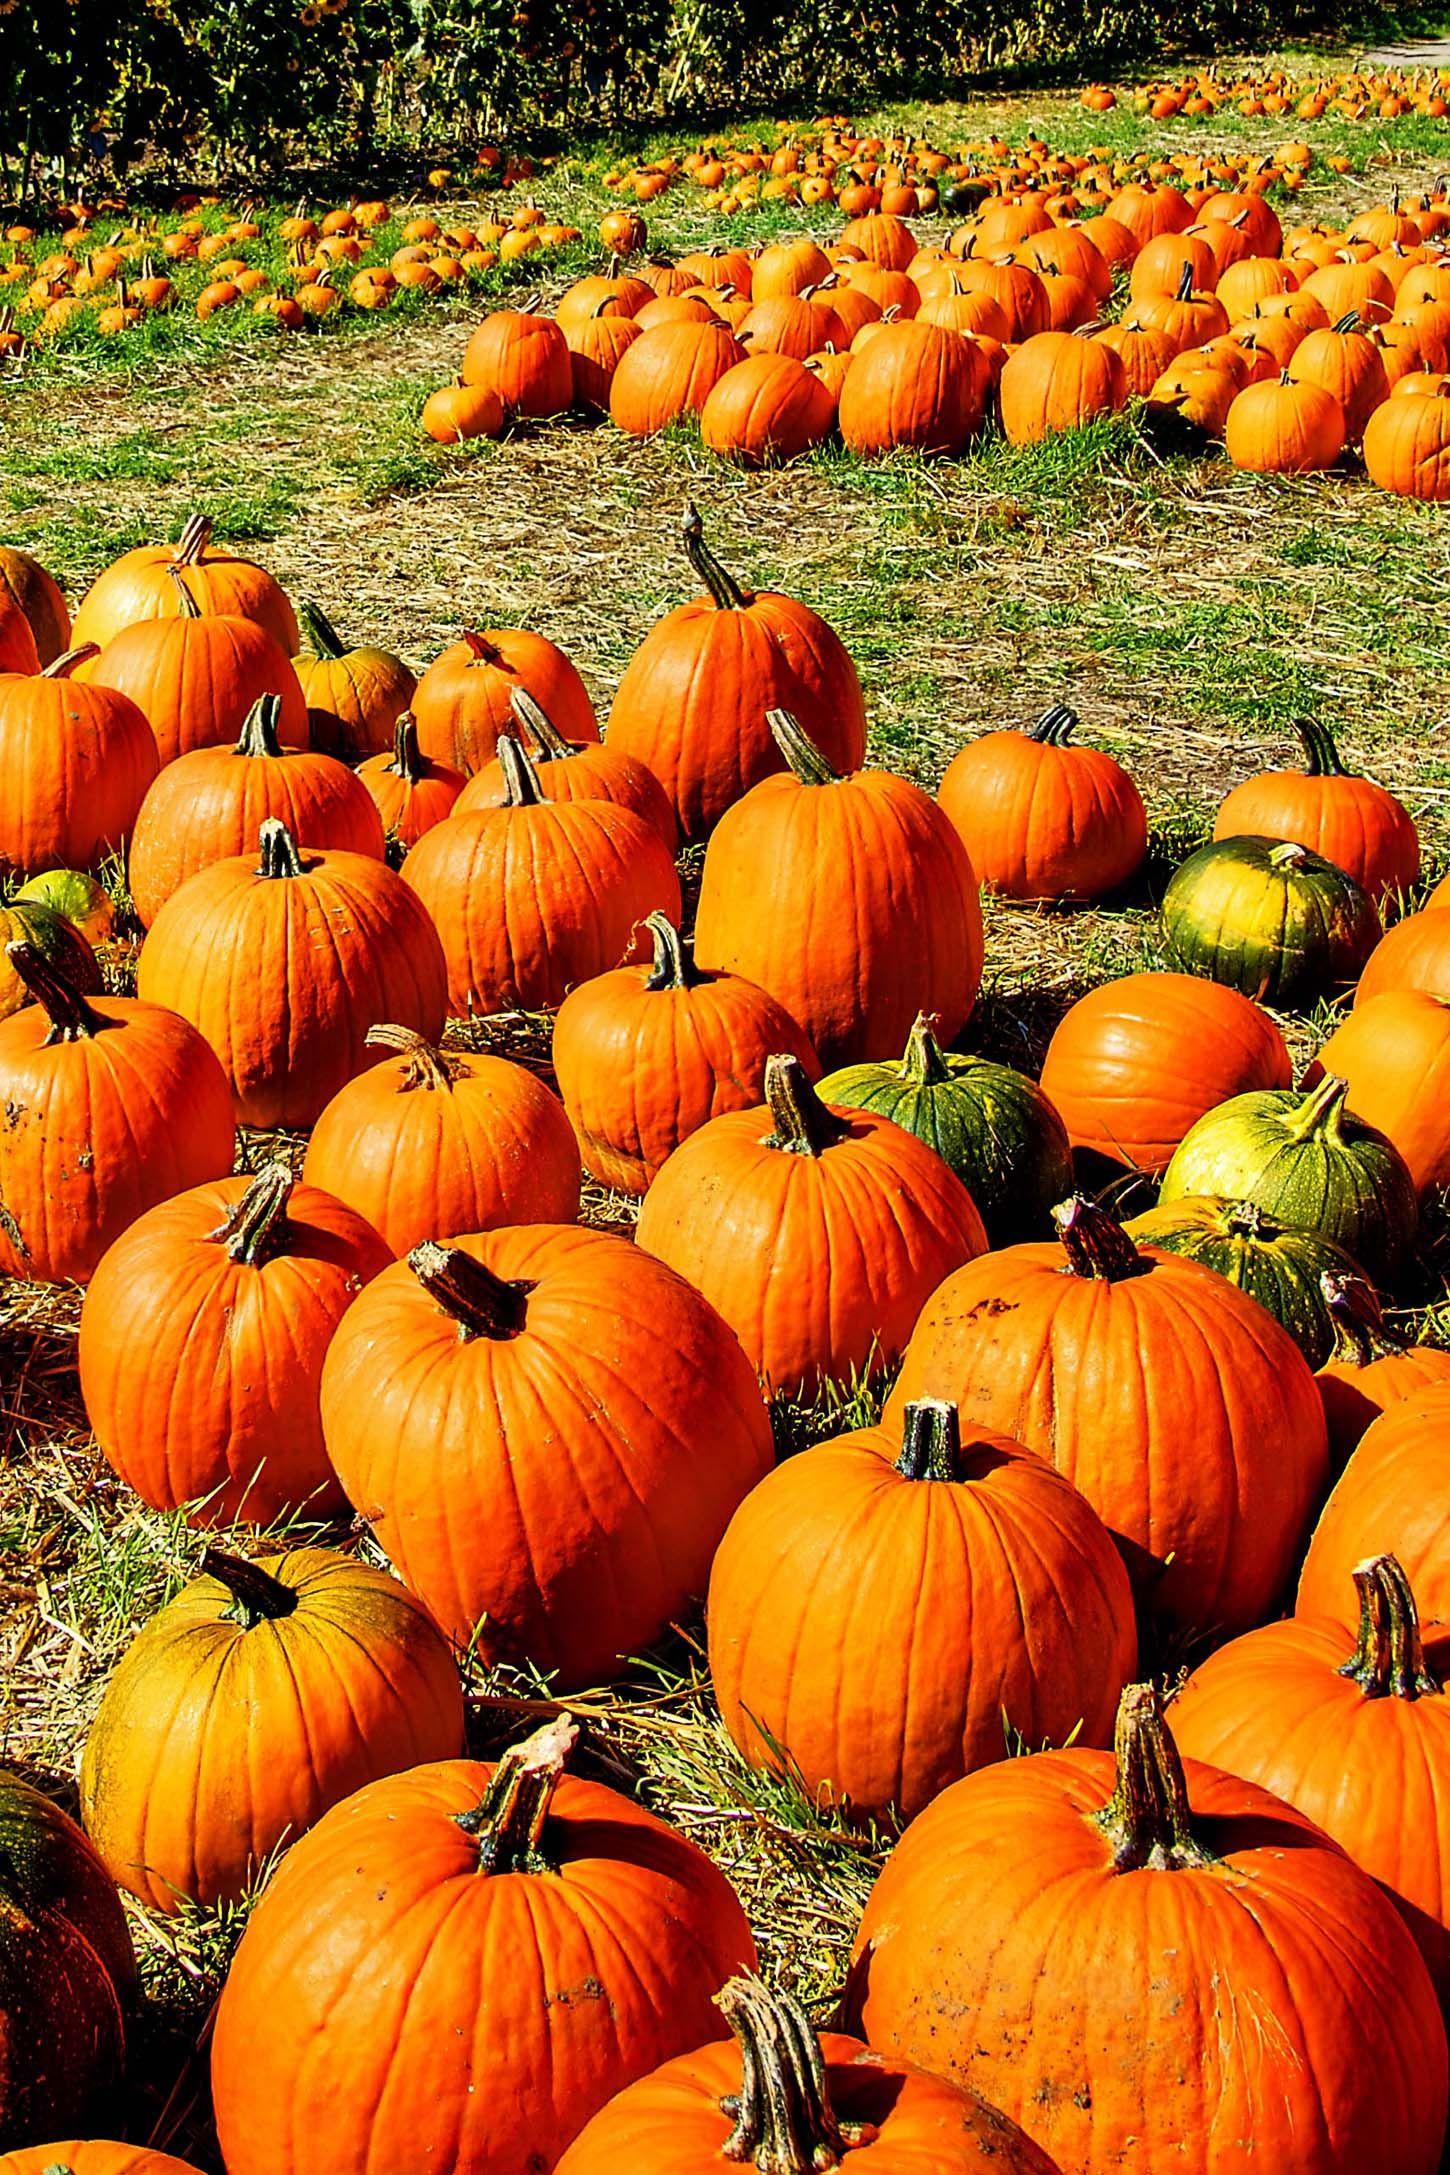 valas pumpkin patch - pumpkin farms near me